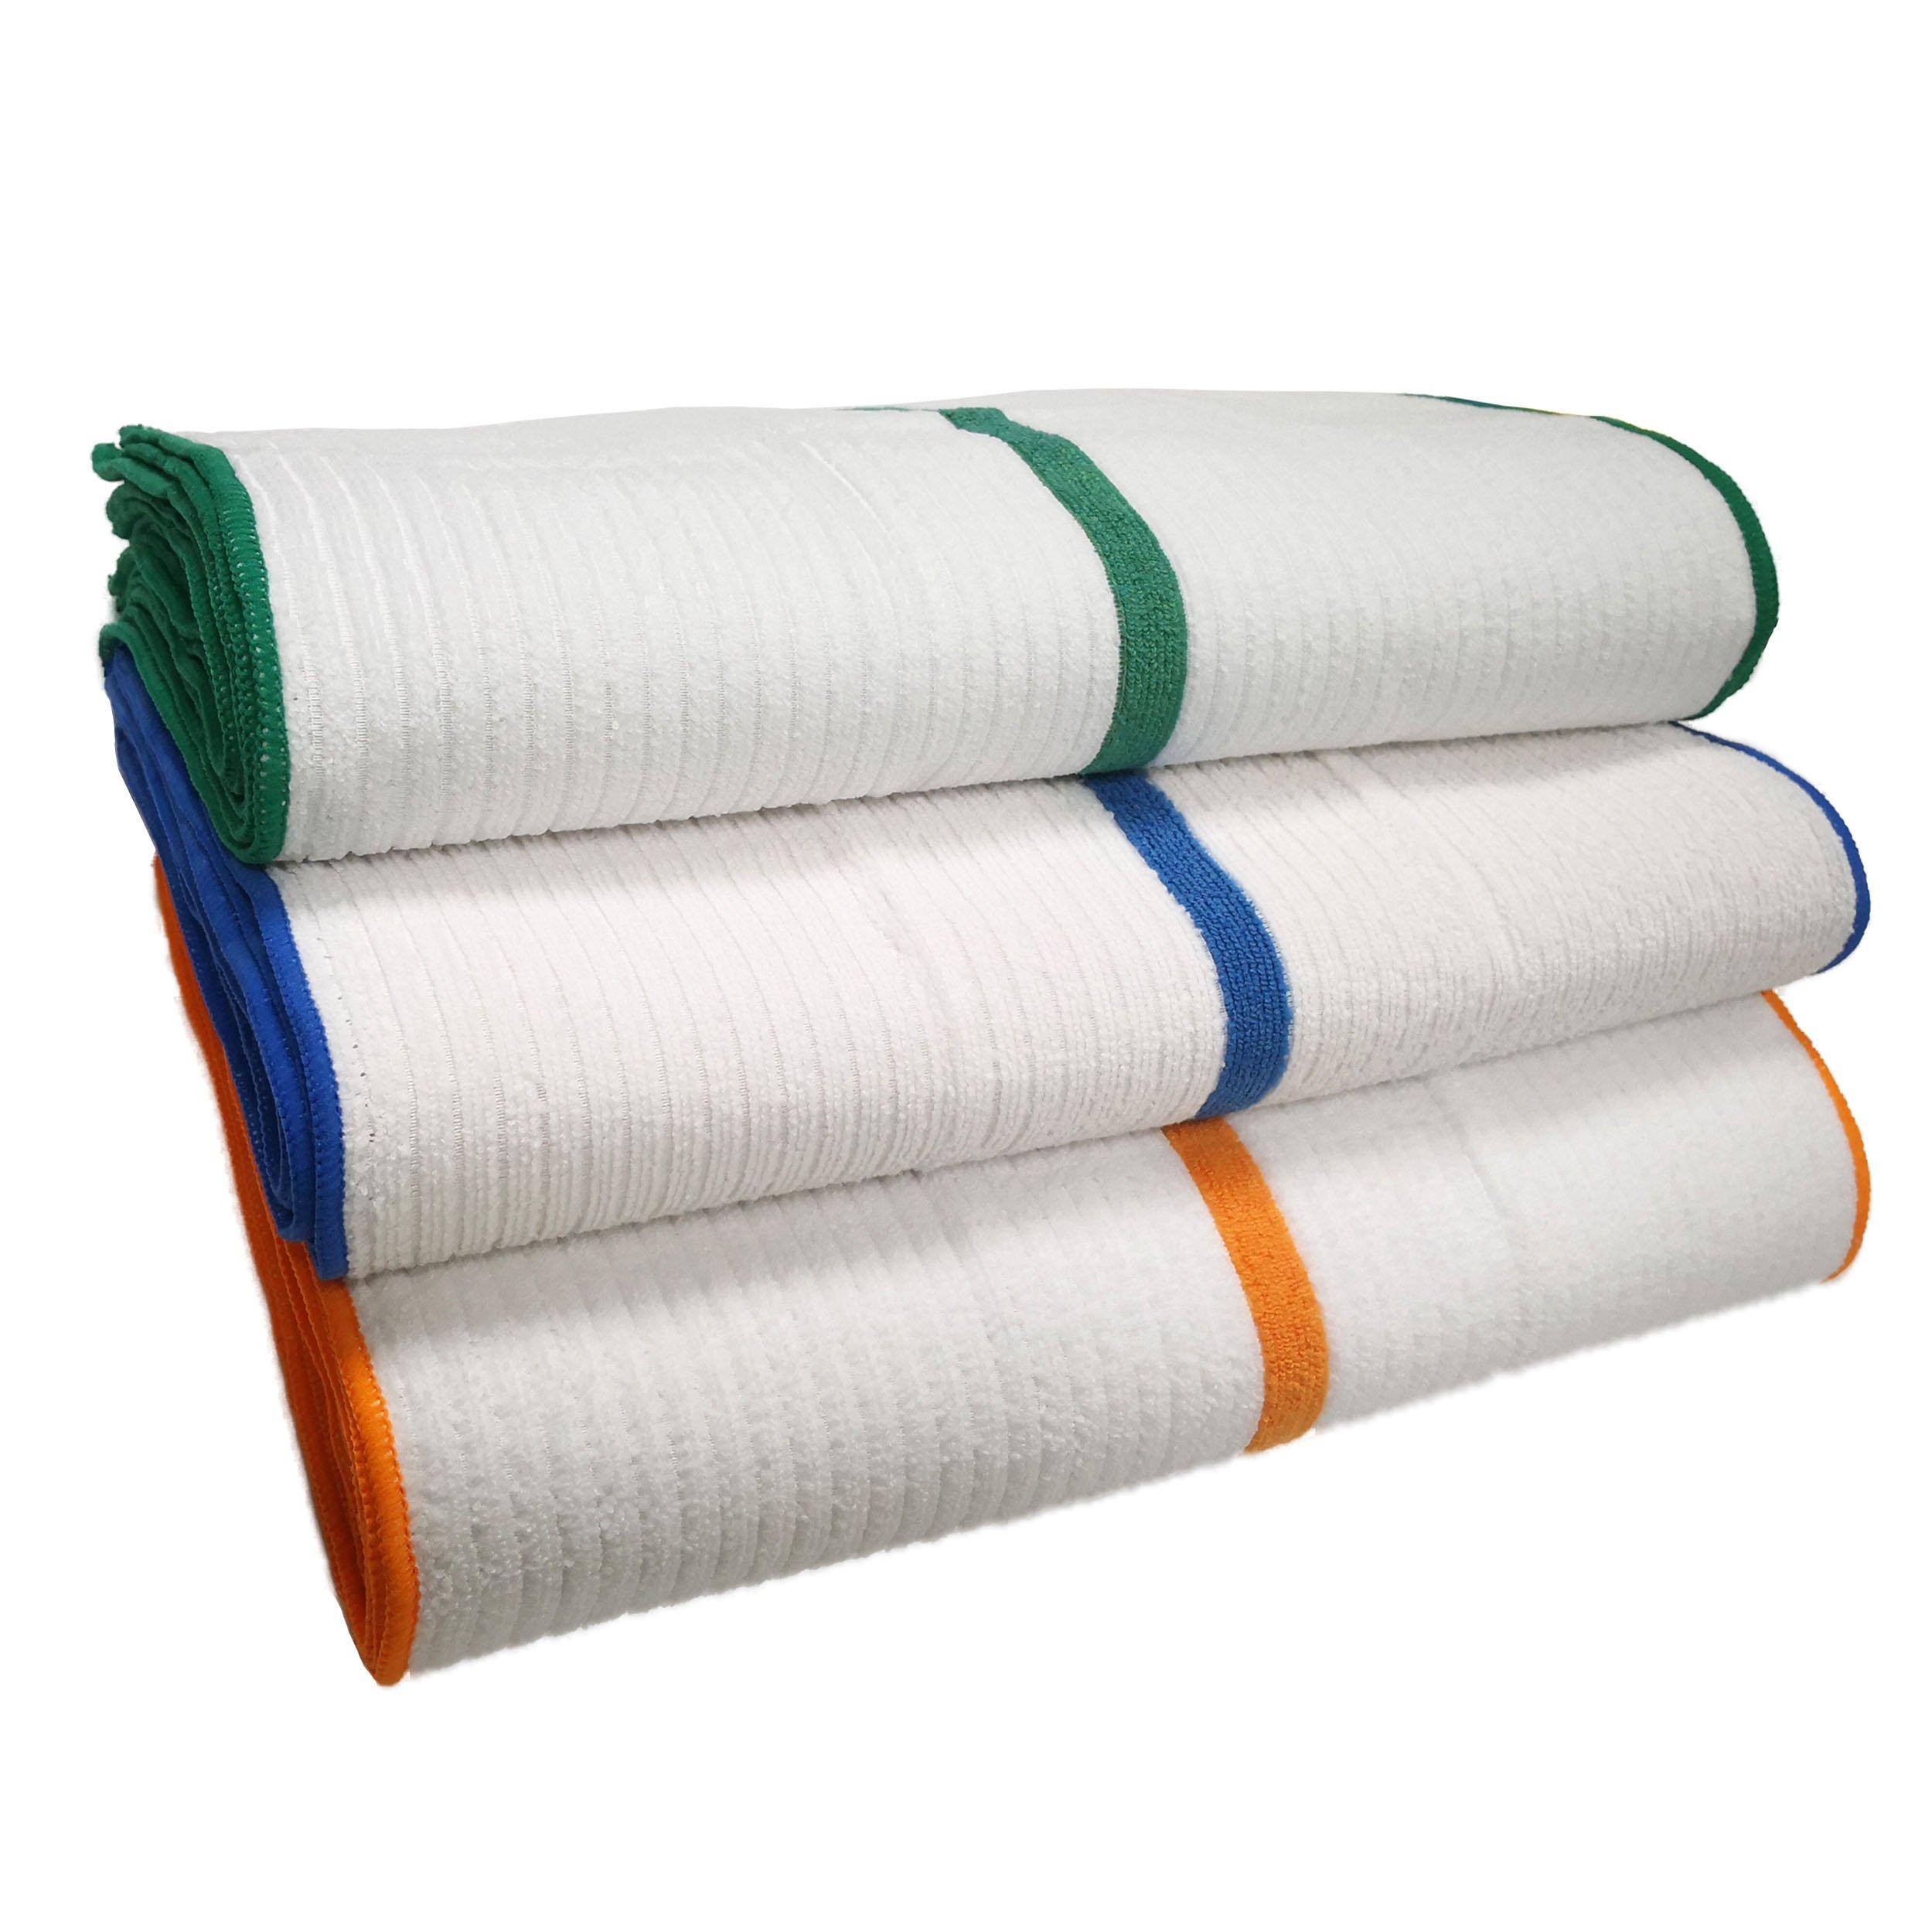 Polyte Microfiber Bar Mop Towel (15x18, White w/Blue,Green, Orange Stripe) 24 Pack